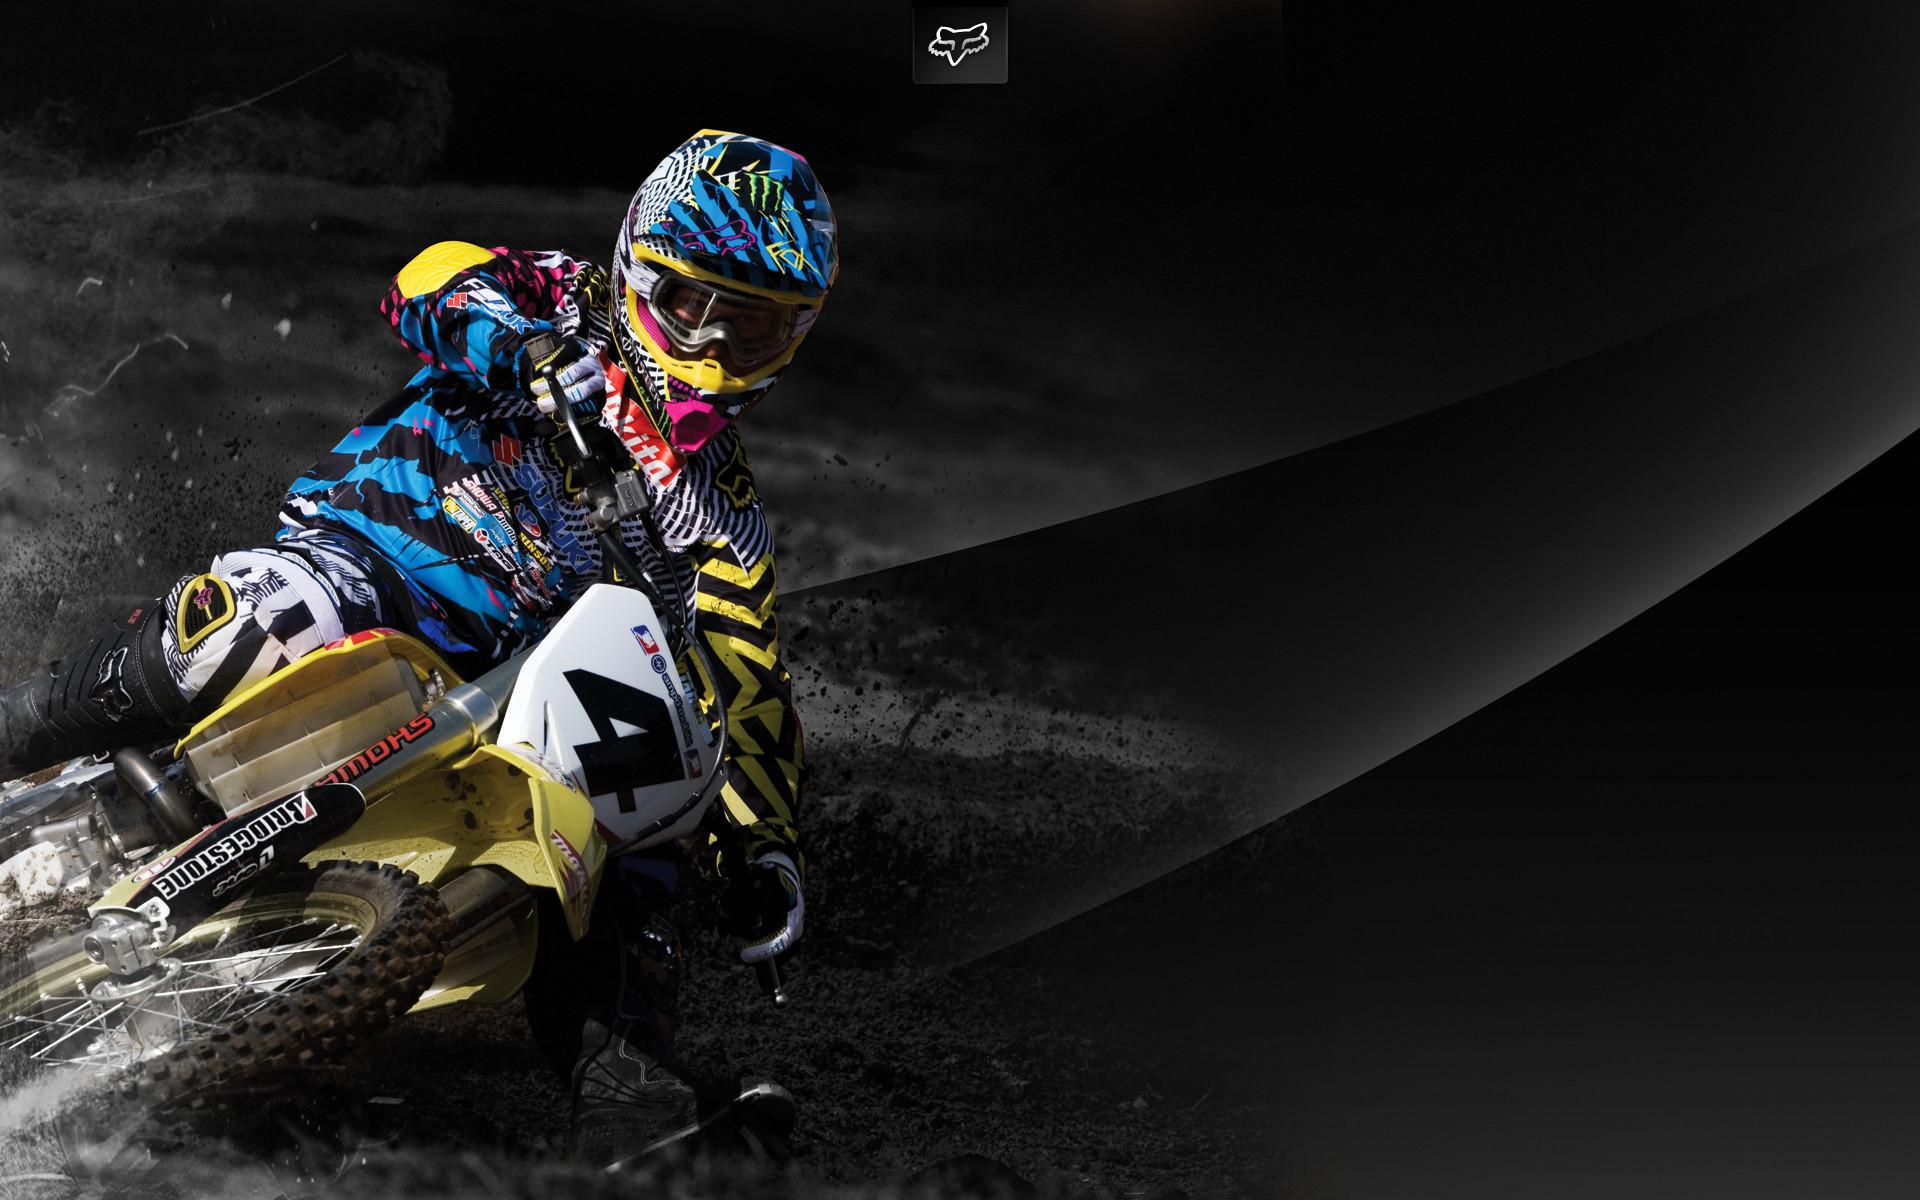 Fox Mx Wallpaper Motocross Fox Racing Background 1920x1200 Download Hd Wallpaper Wallpapertip